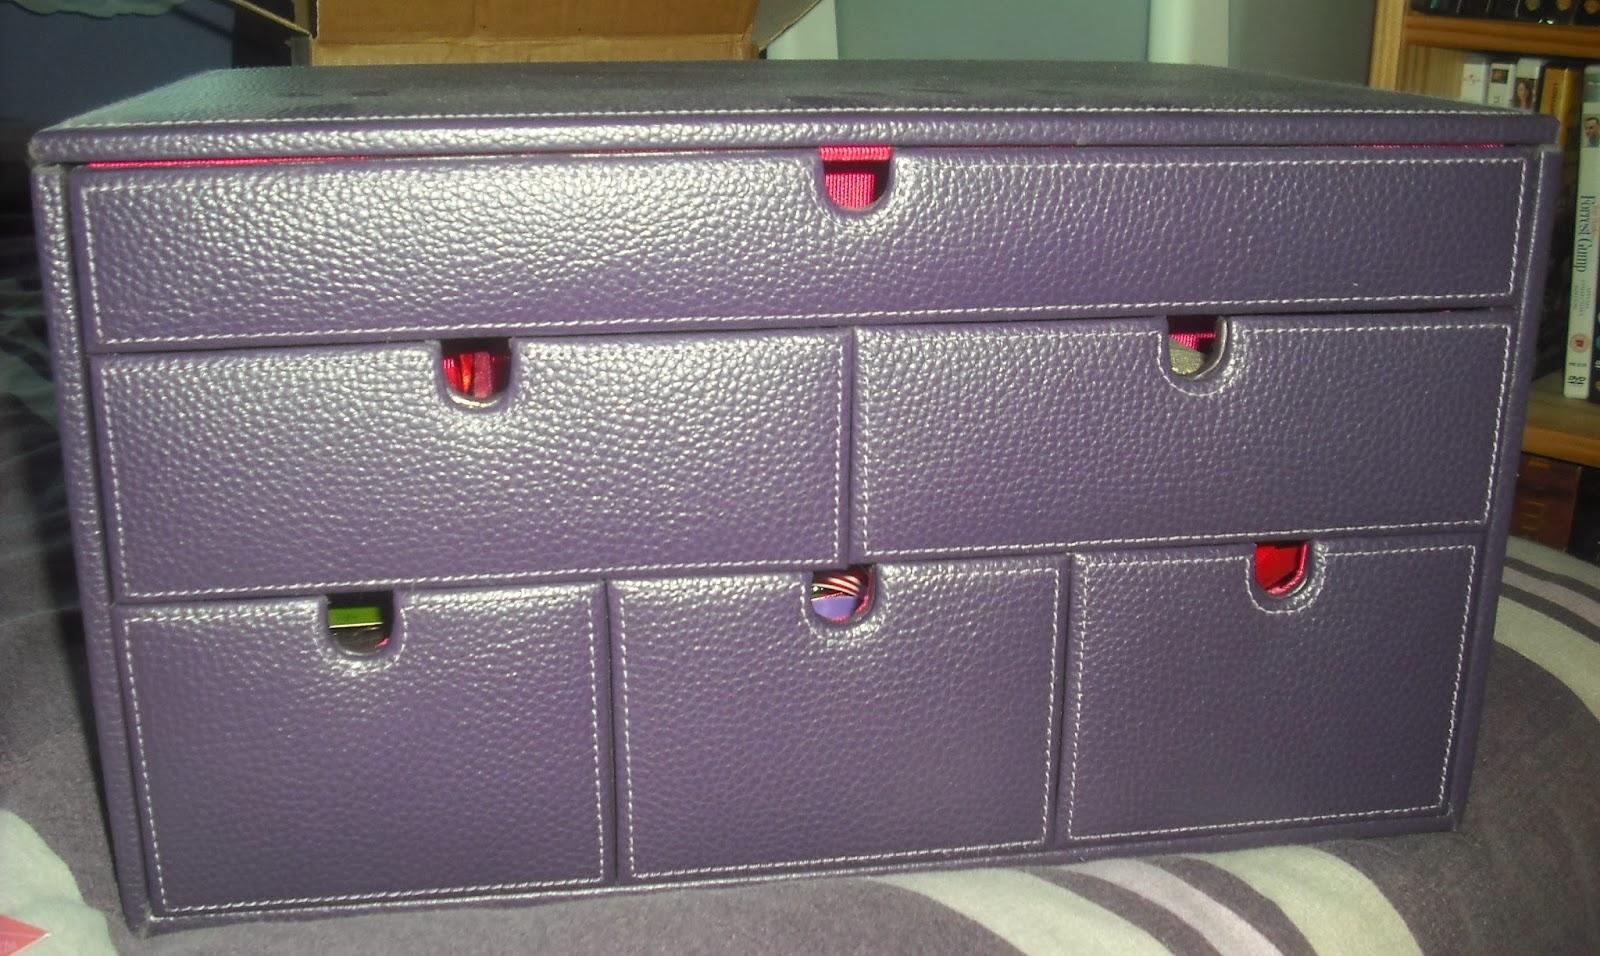 Tania Michele Inside My Jewelry Box